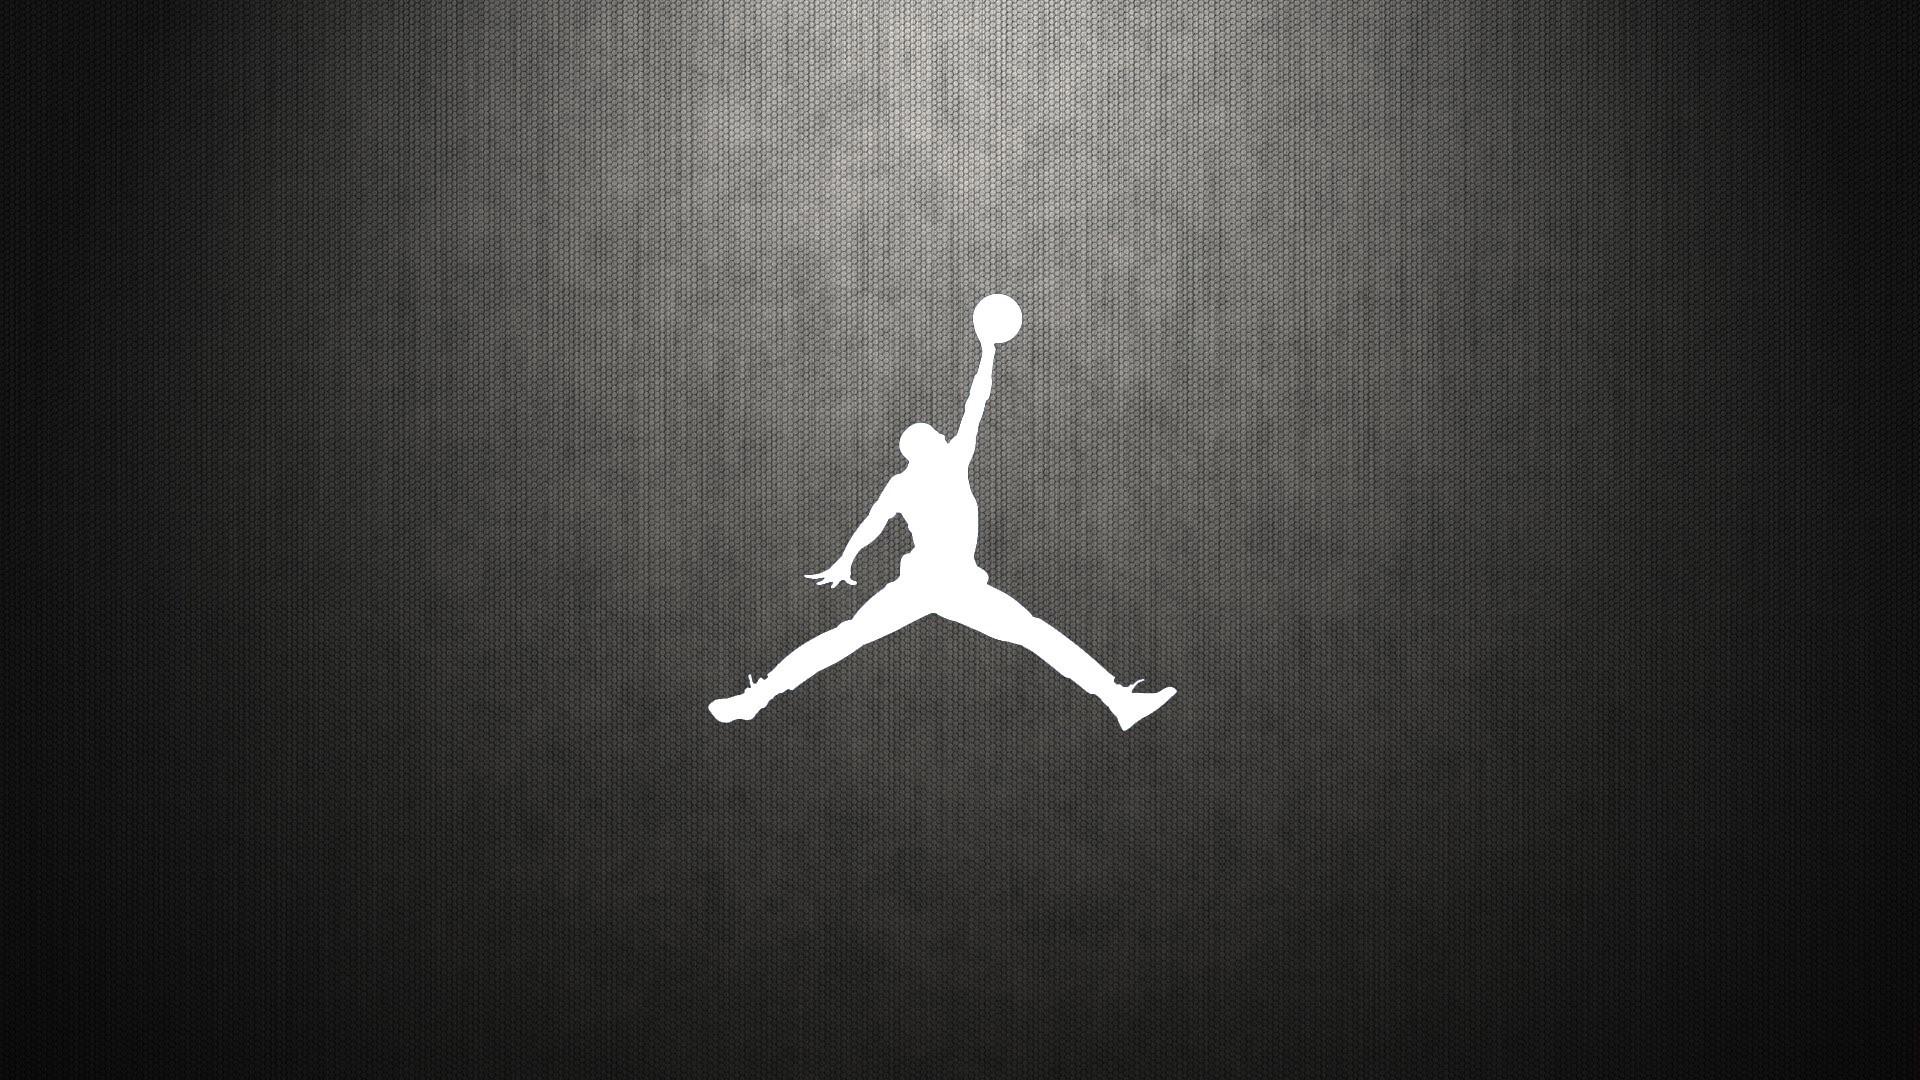 Nike Basketball Wallpapers 3587   Amazing Wallpaperz 1920x1080